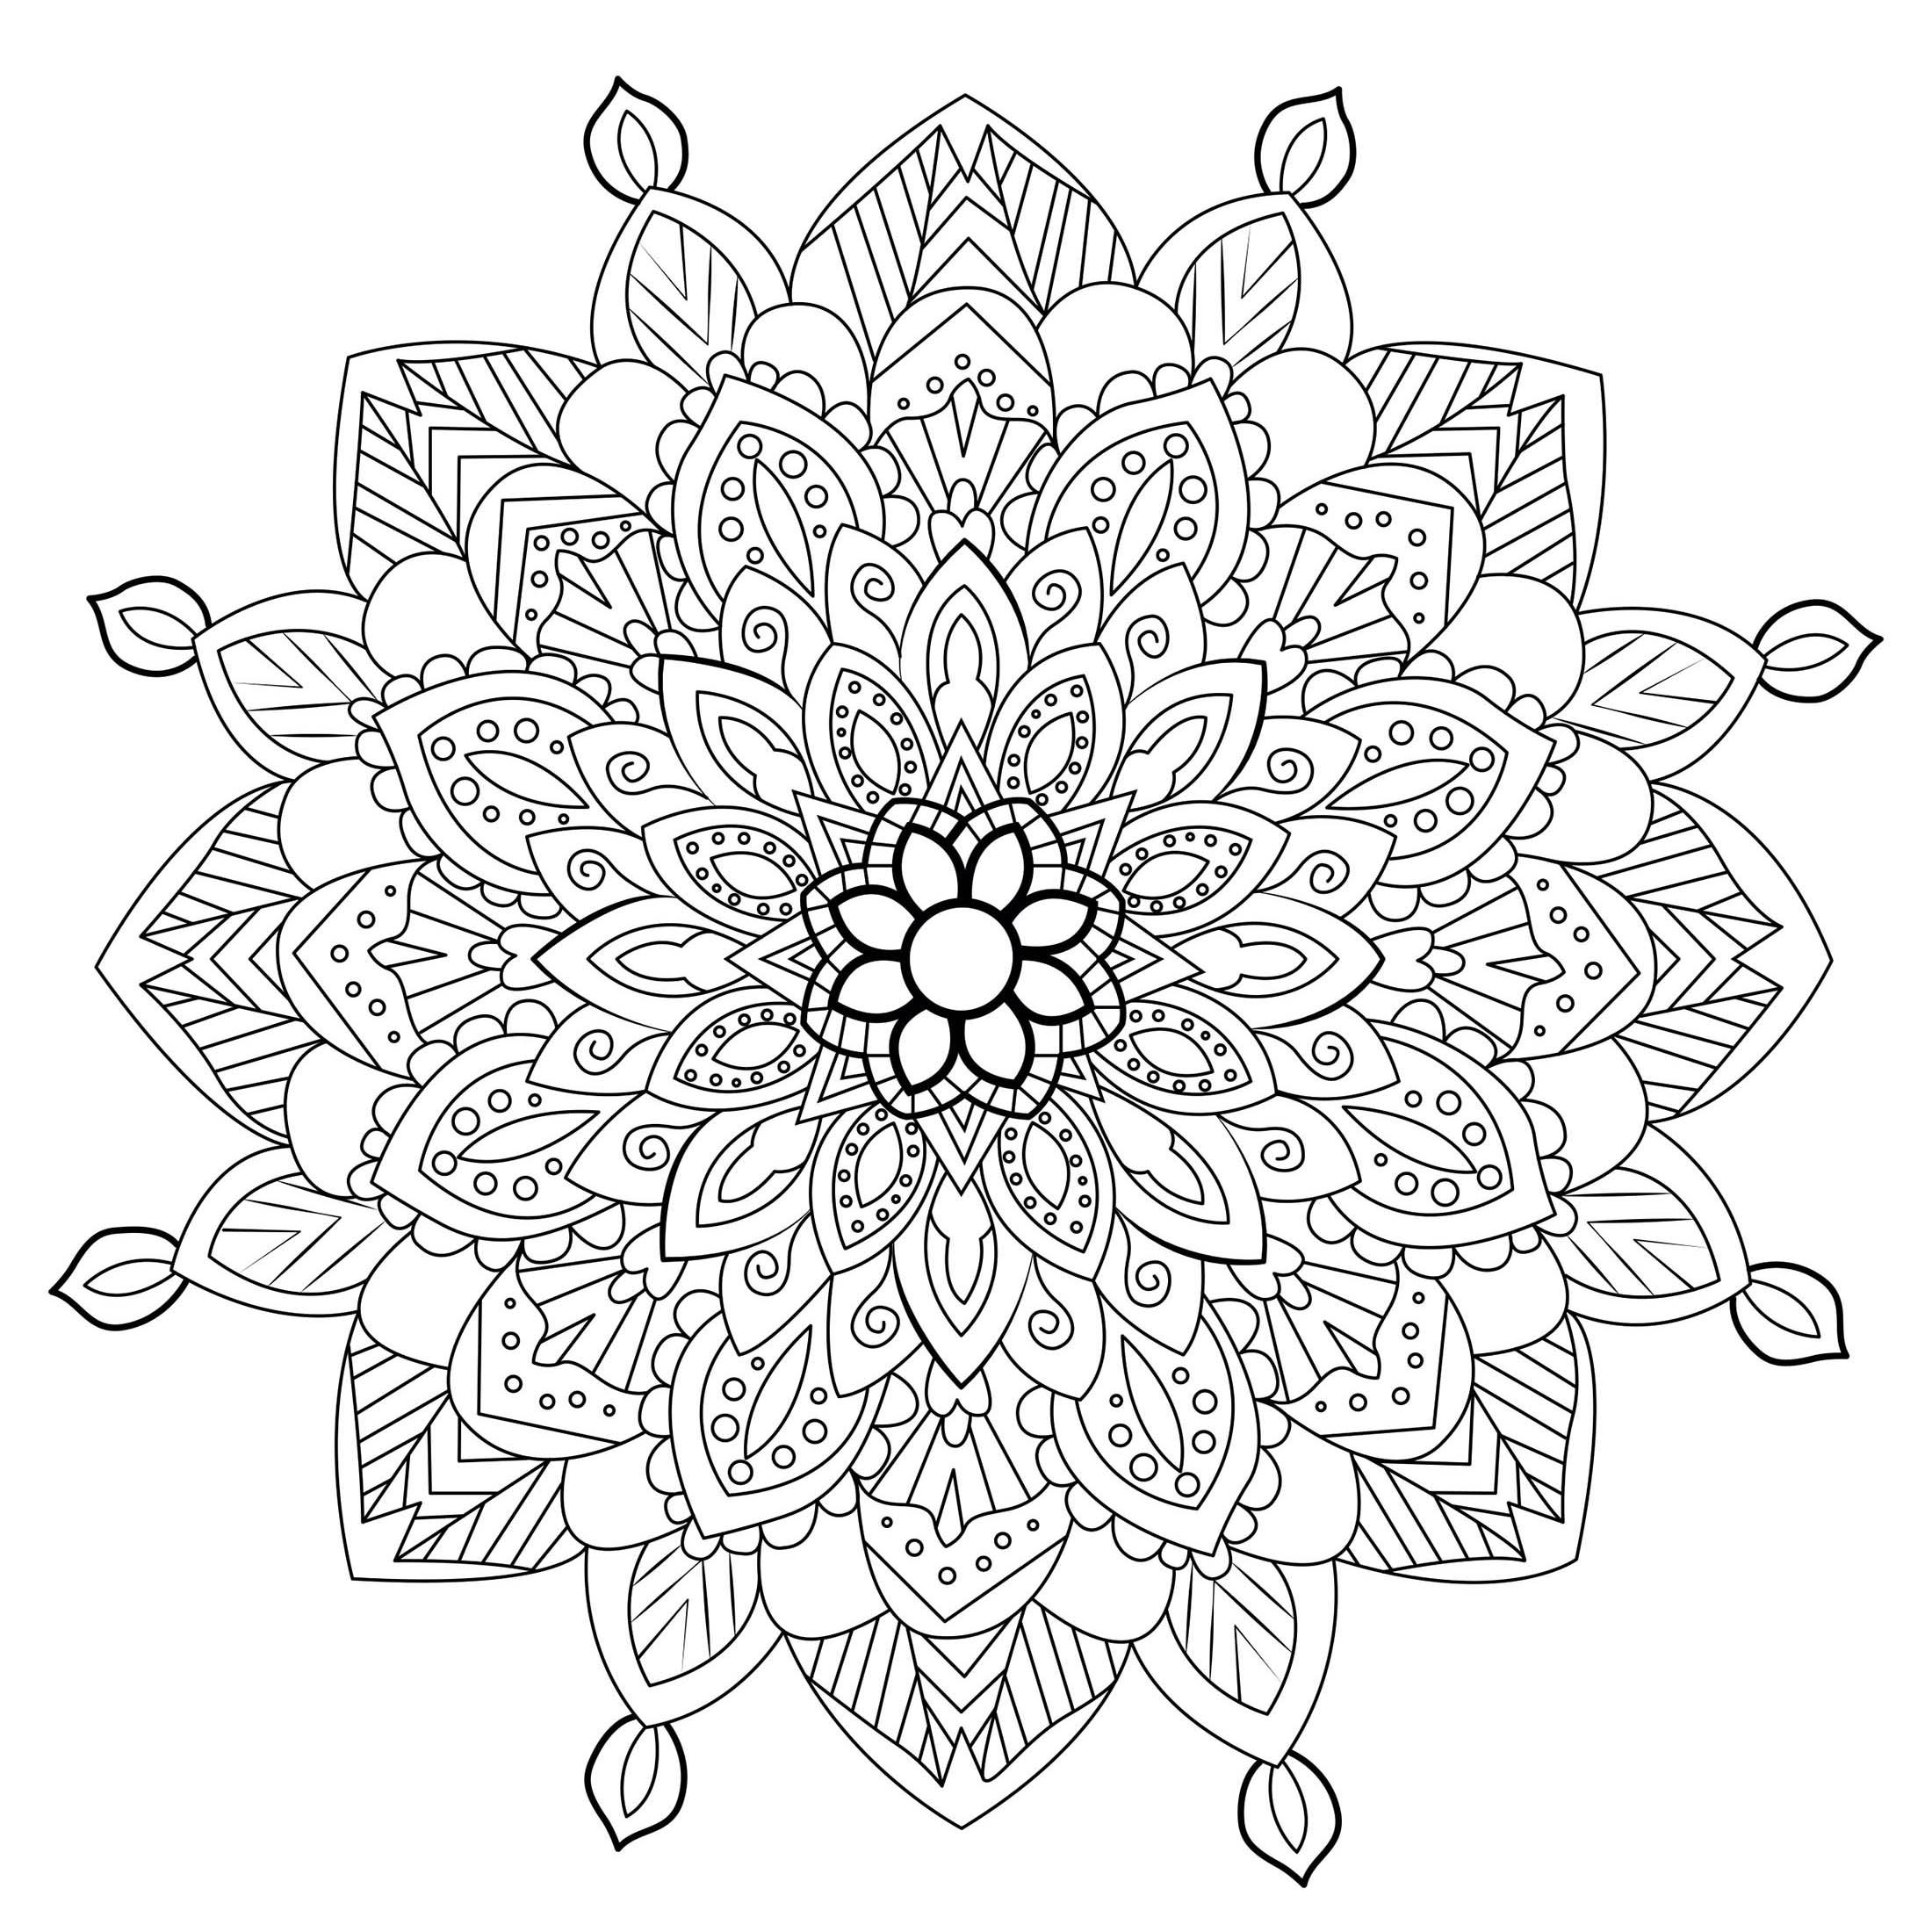 Mandala Zen & Anti-stress - 3